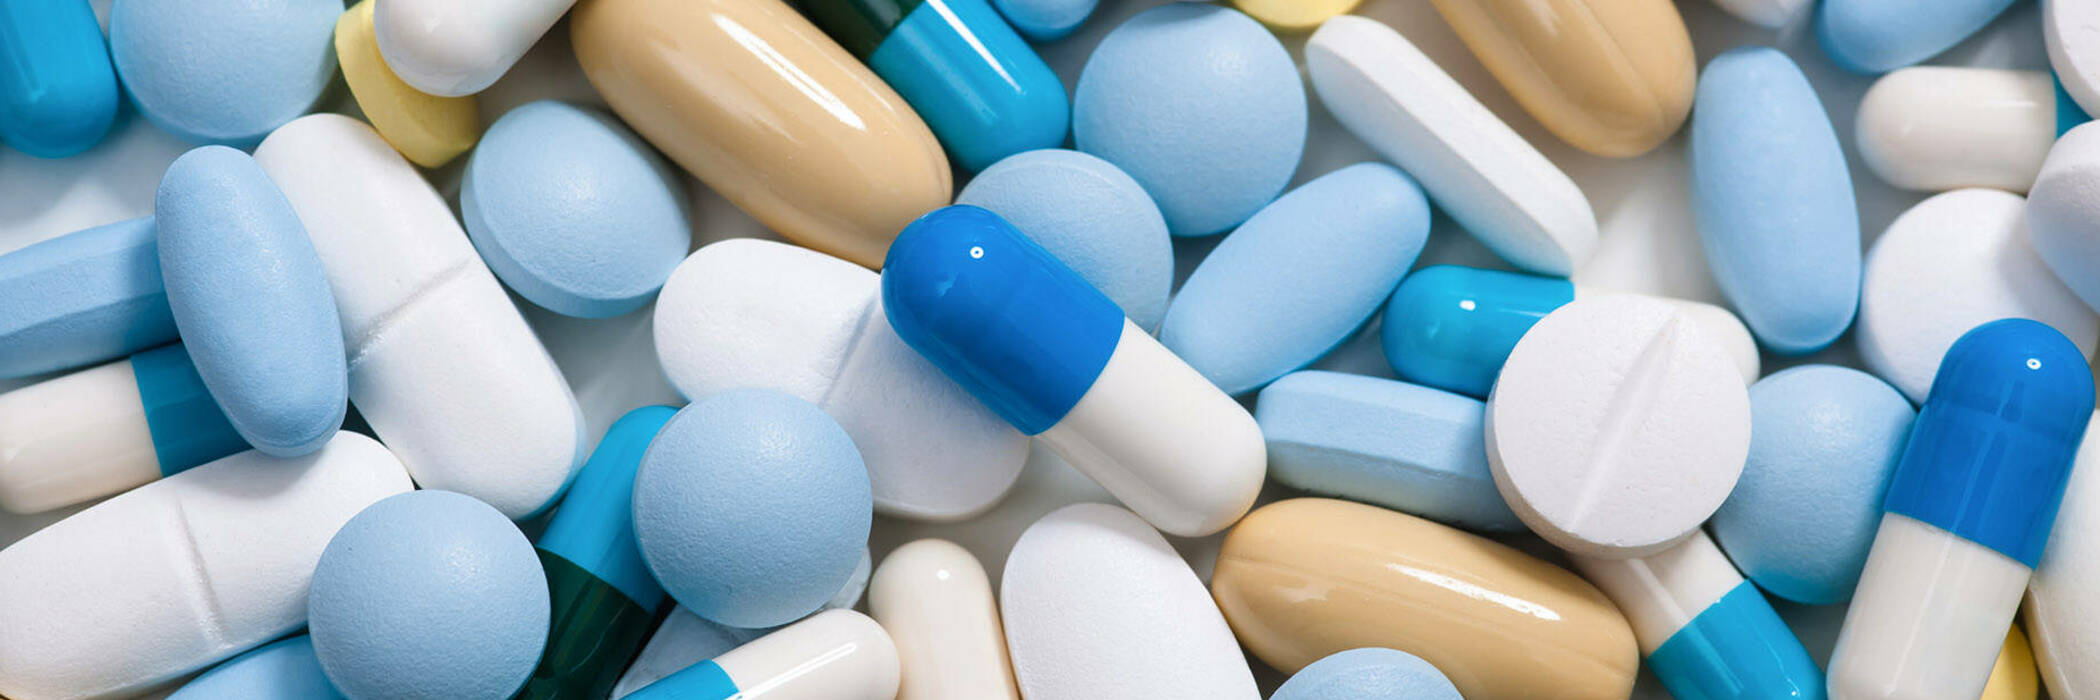 16nov more antibiotics in food production hero